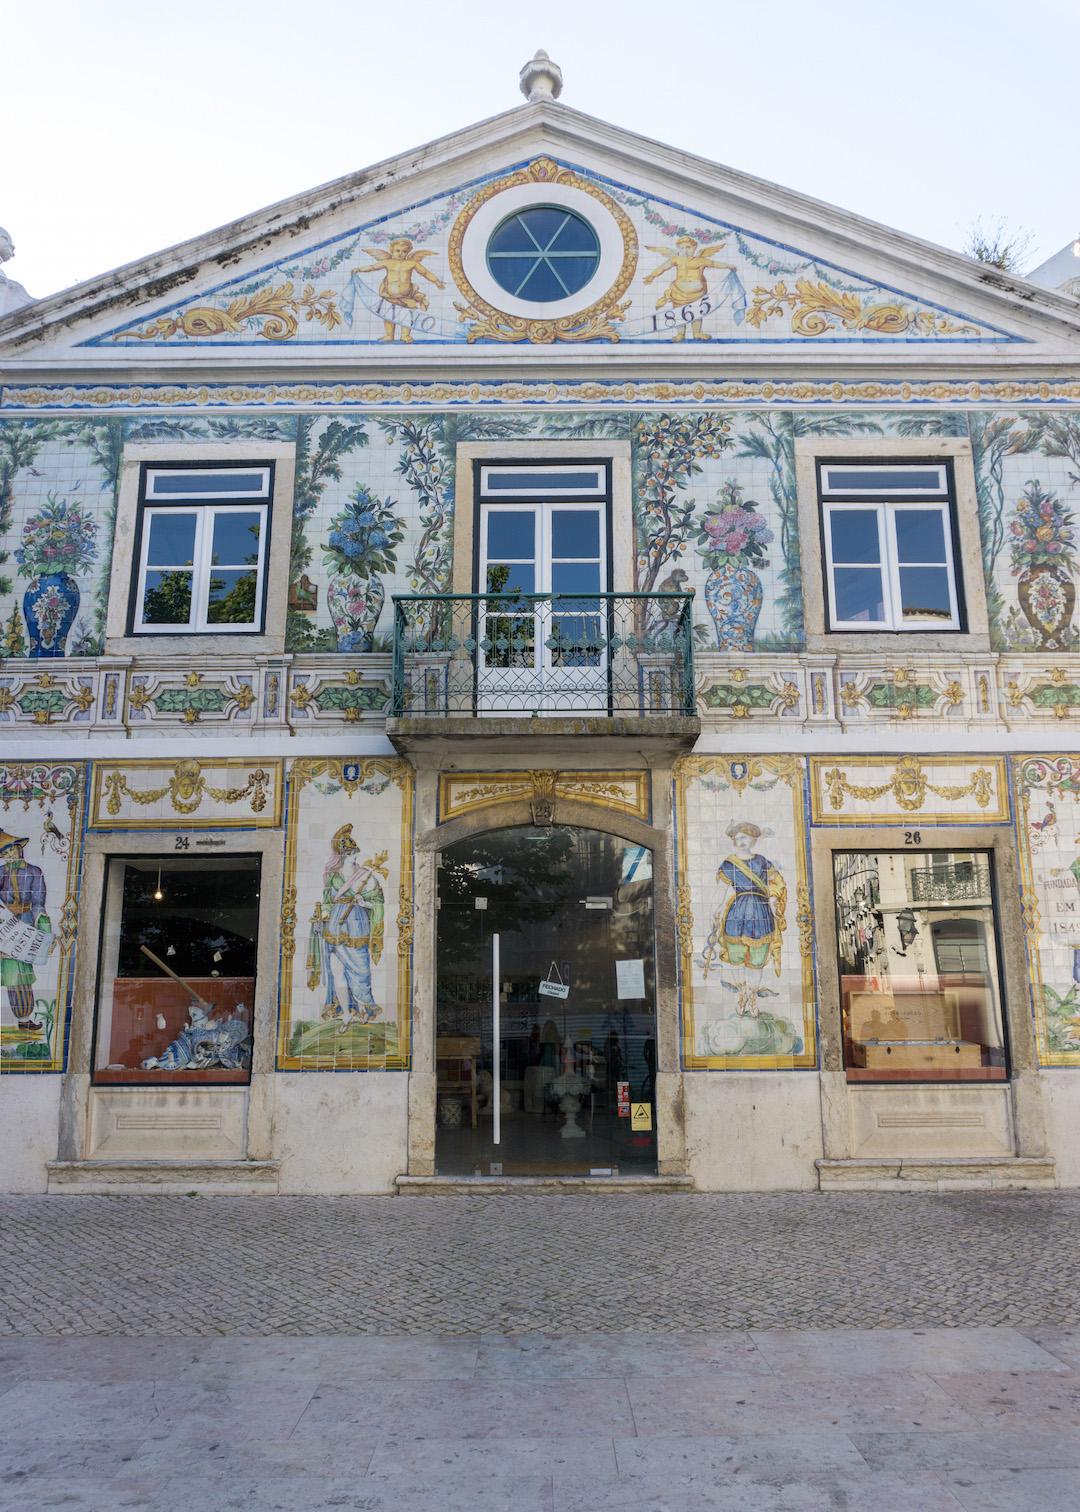 Her_Travel_Edit_Lisbon_Building